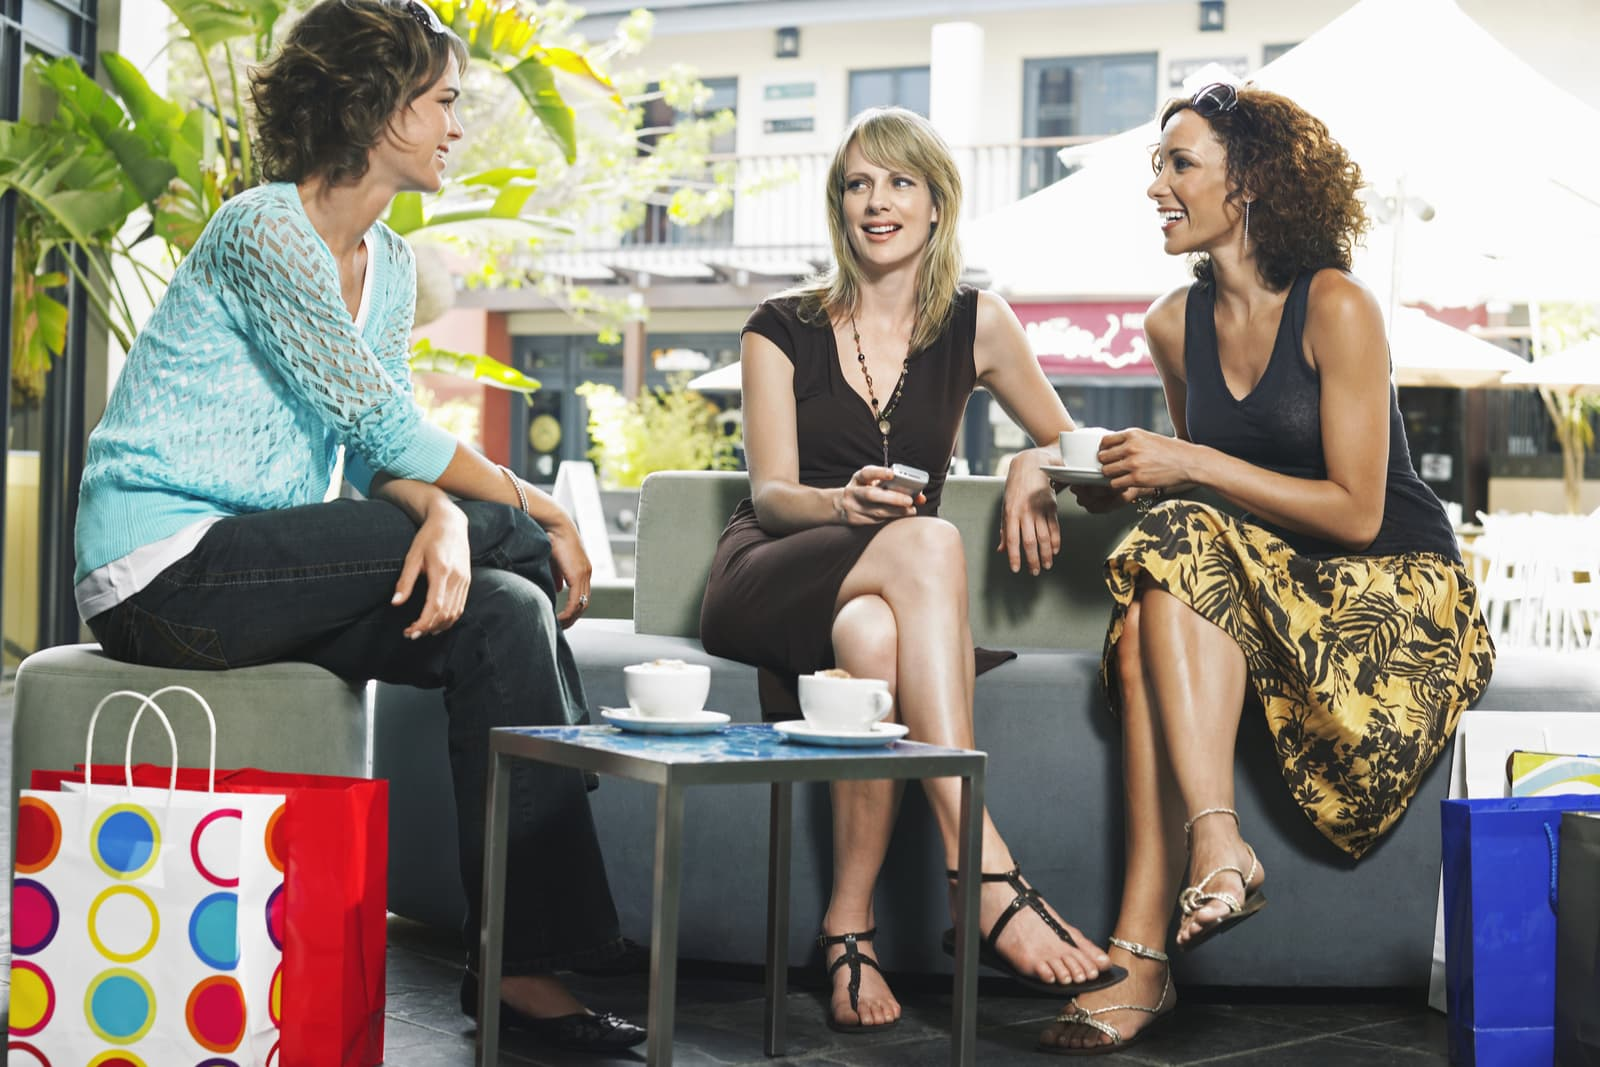 three friends sit drinking coffee and talking